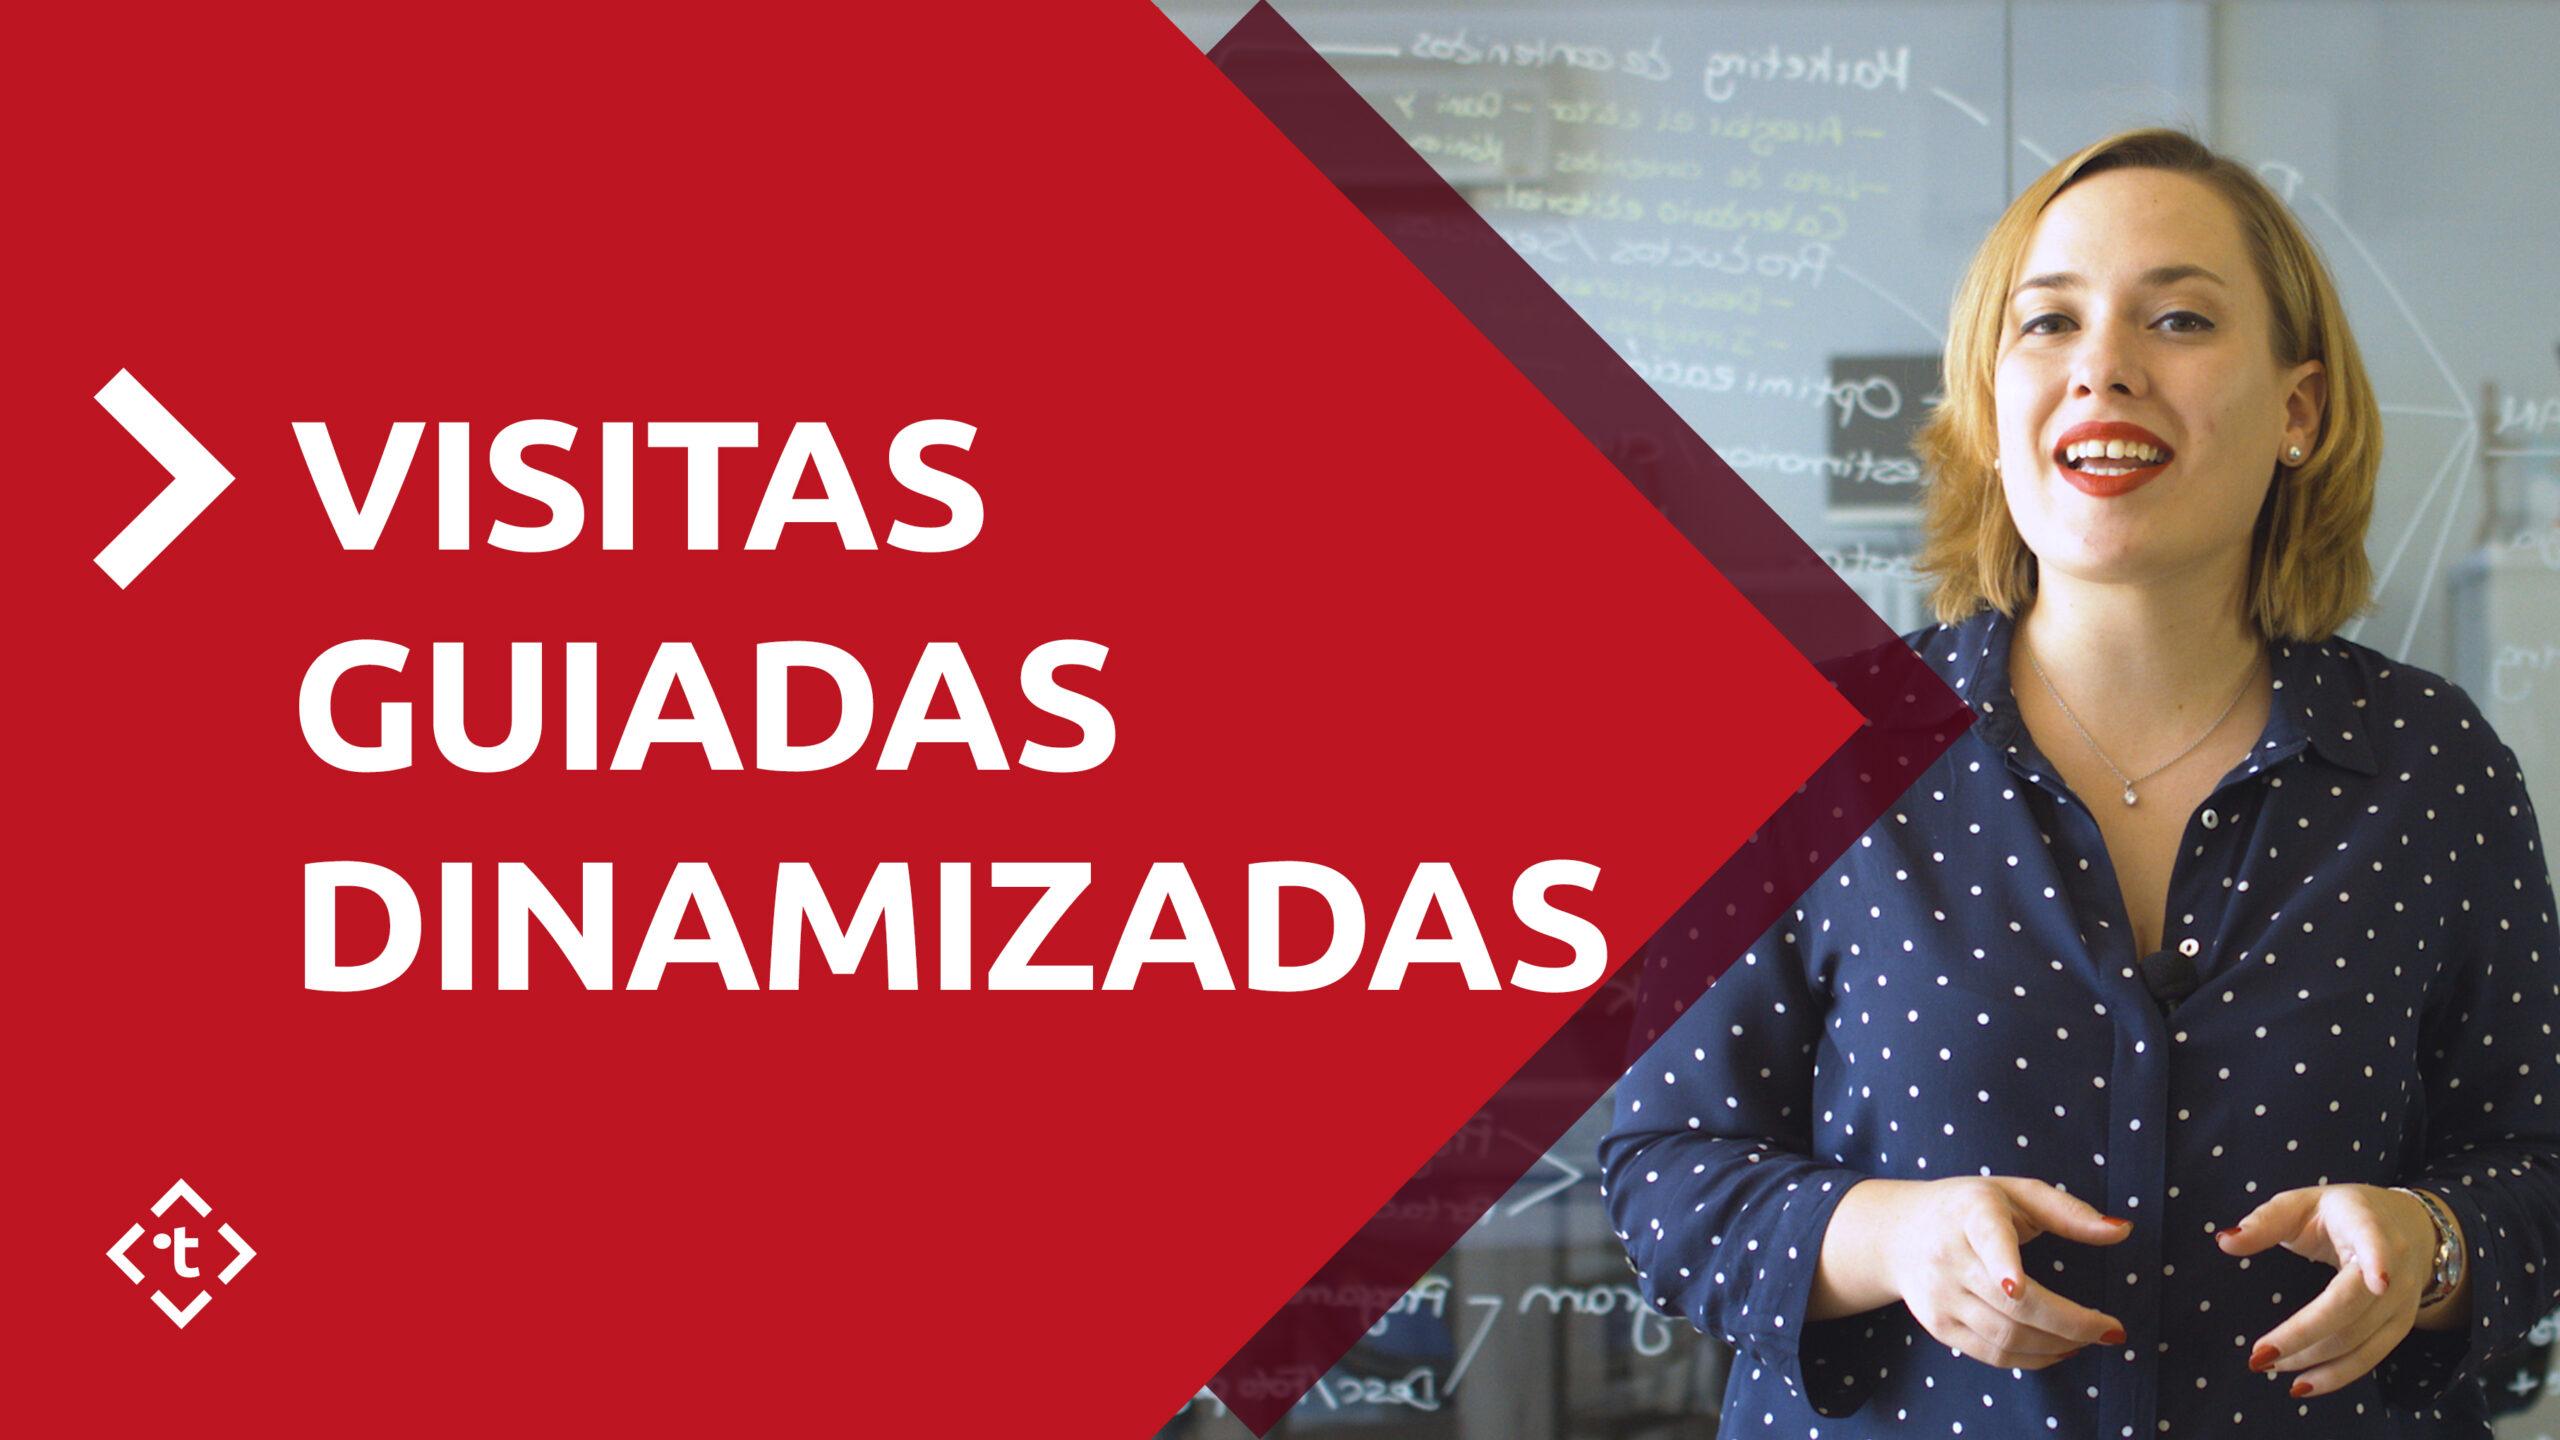 VISITAS GUIADAS DINAMIZADAS